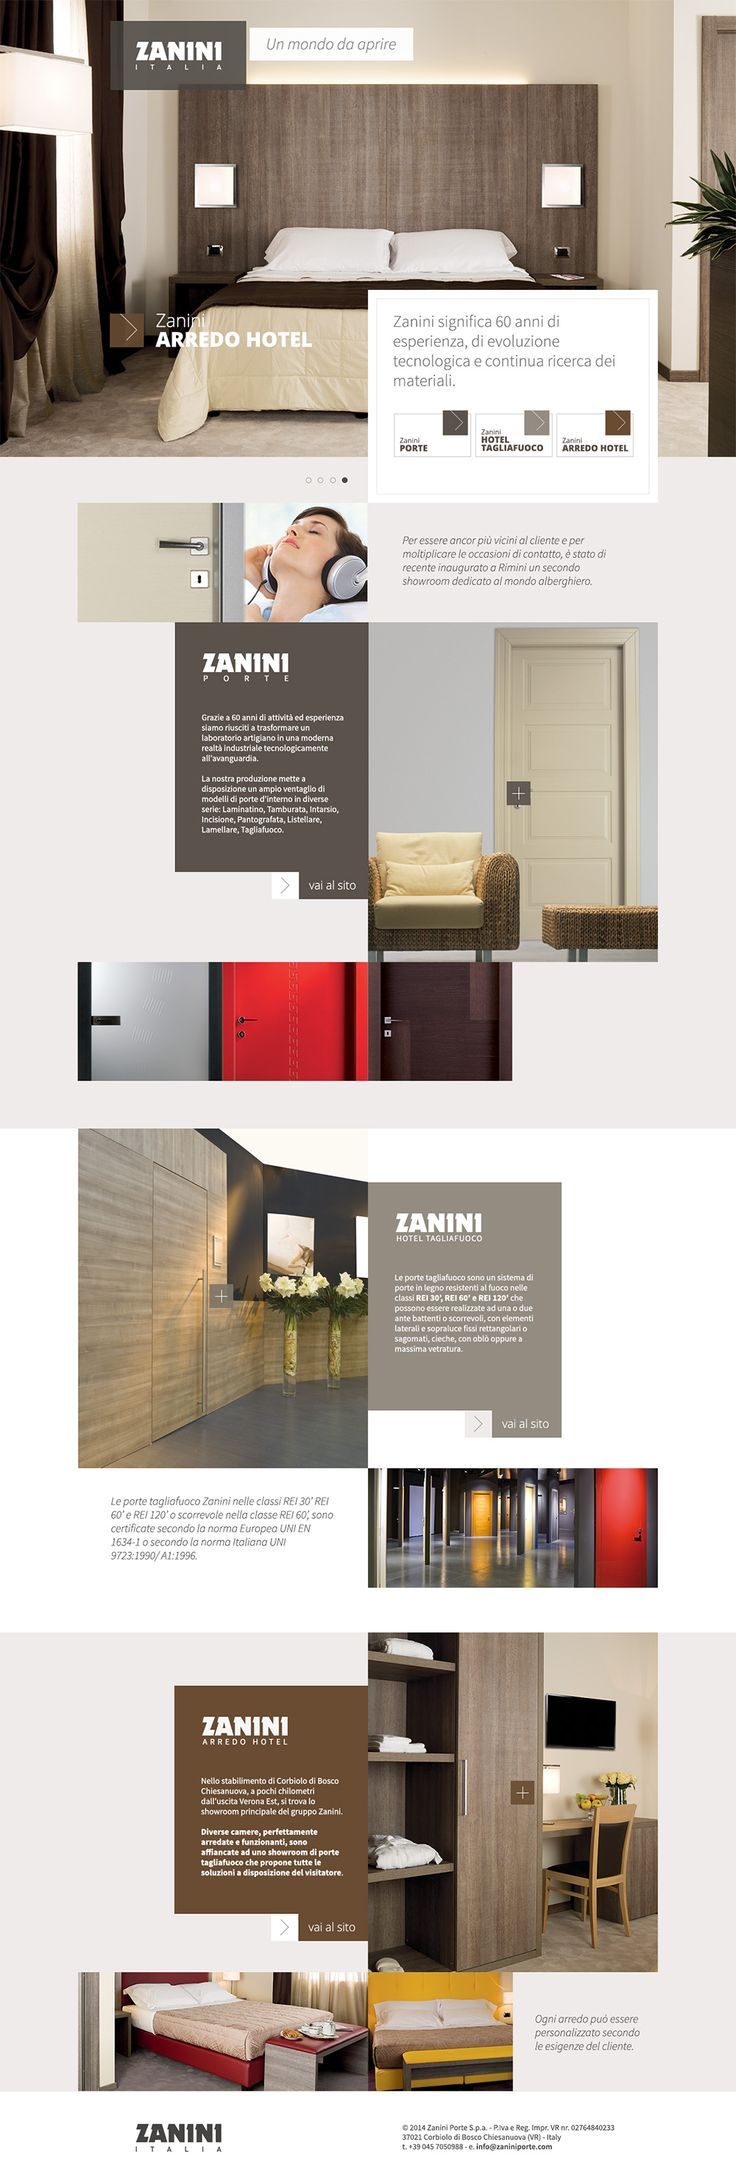 Zanini Italia: entrance page for the company's different websites